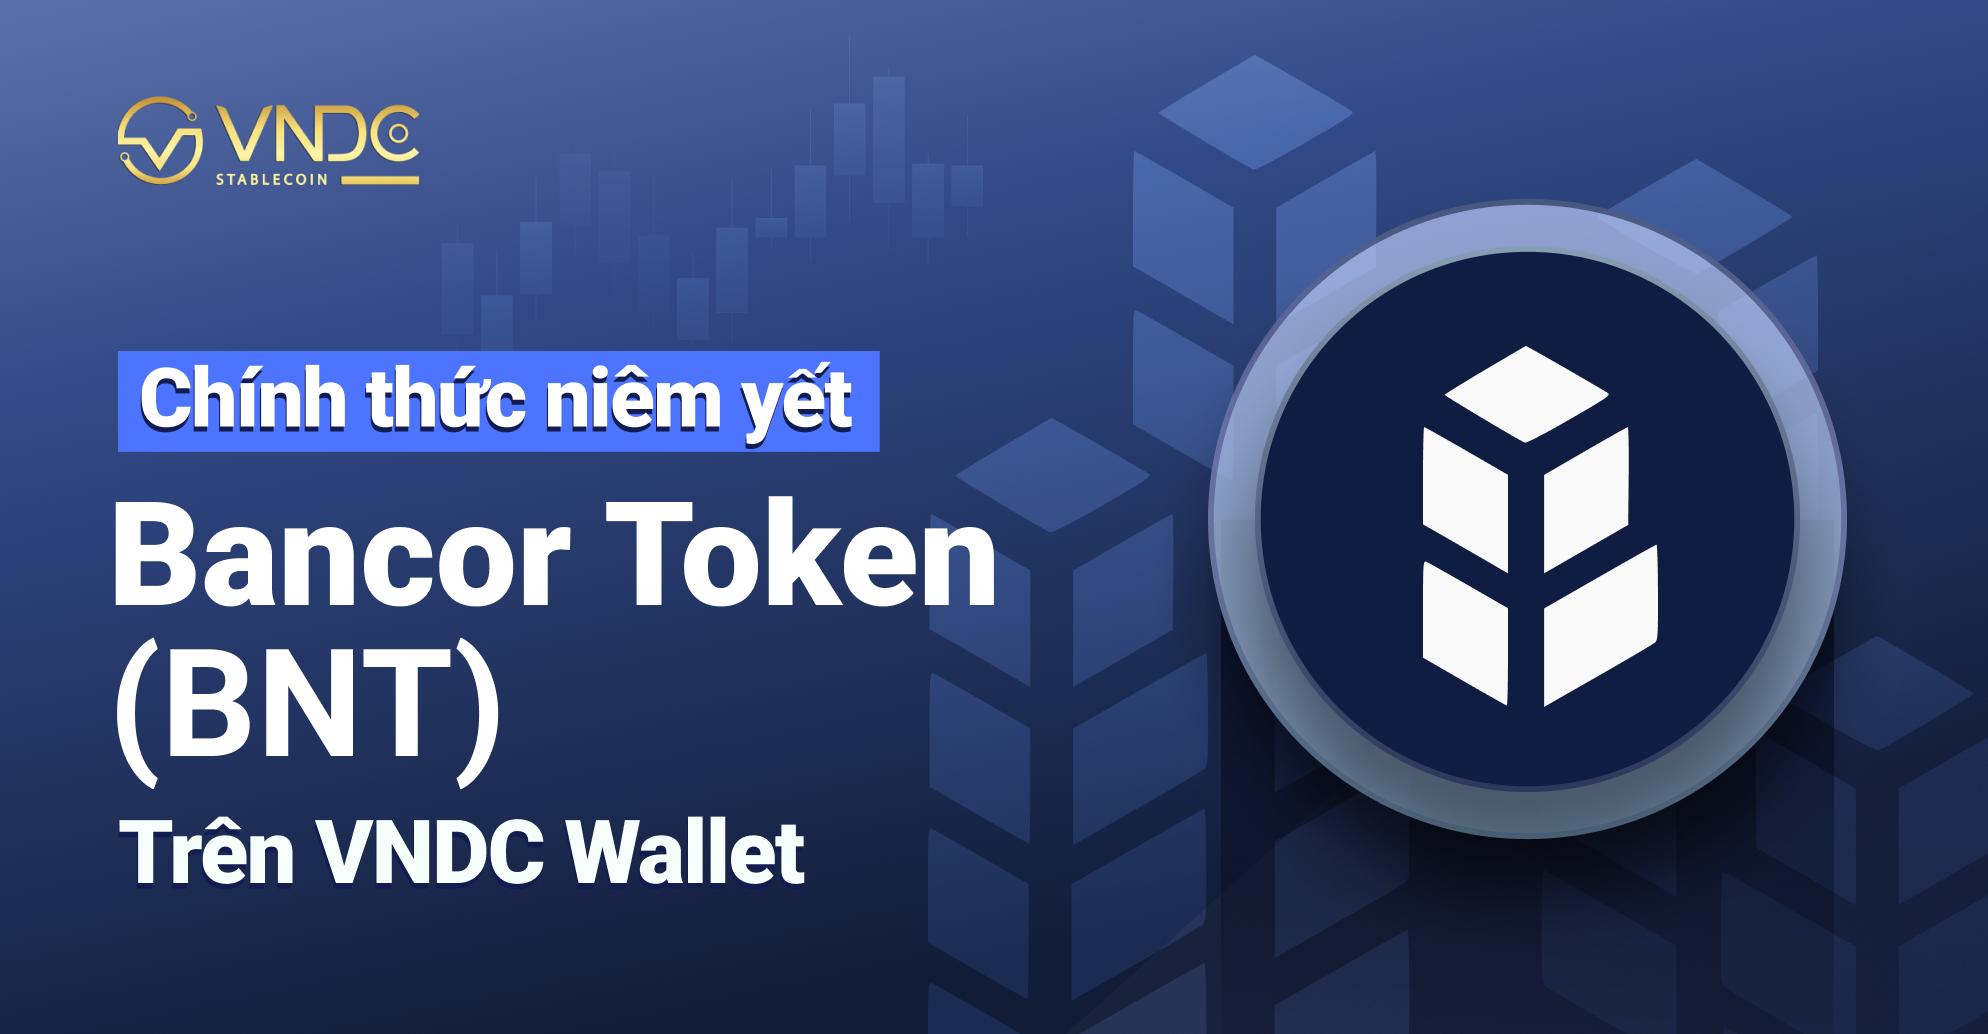 Niêm yết Bancor Token (BNT) trên VNDC Wallet